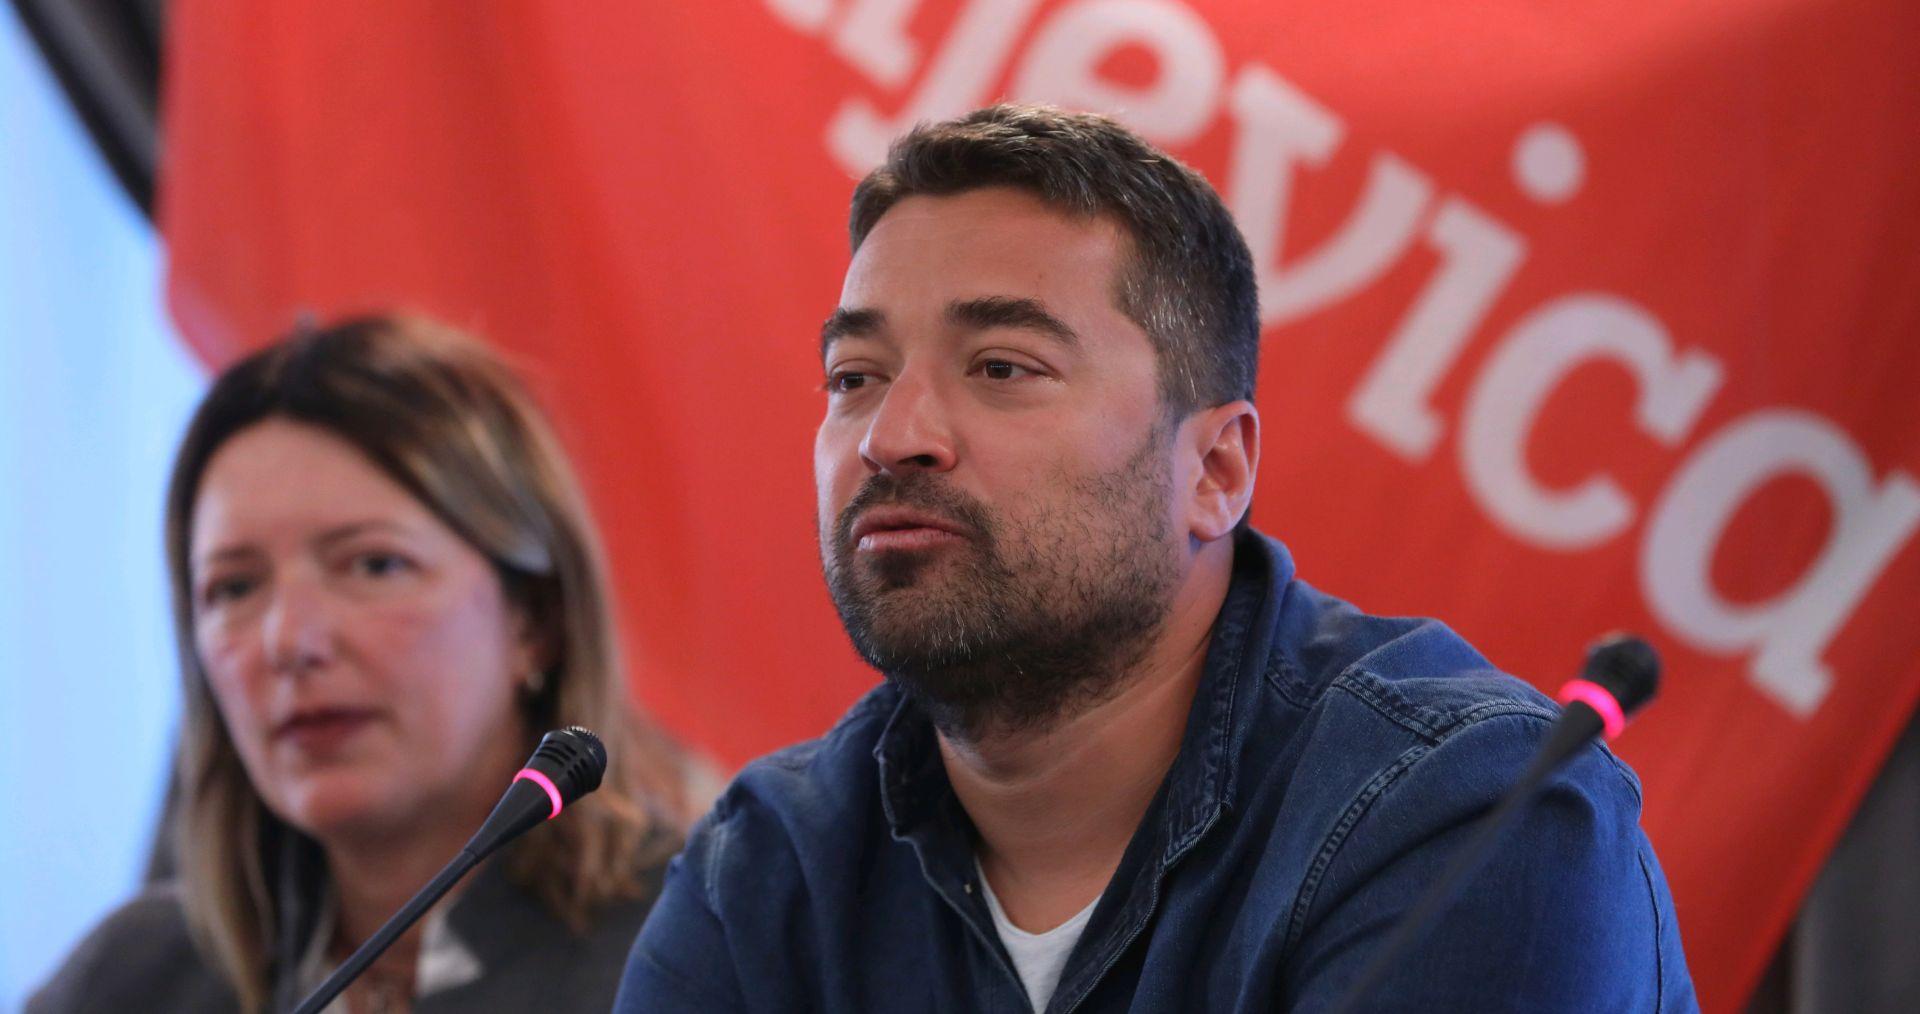 Markovina (Nova ljevica) pozvao sve birače s ljevice da bojkotiraju drugi izborni krug u Splitu